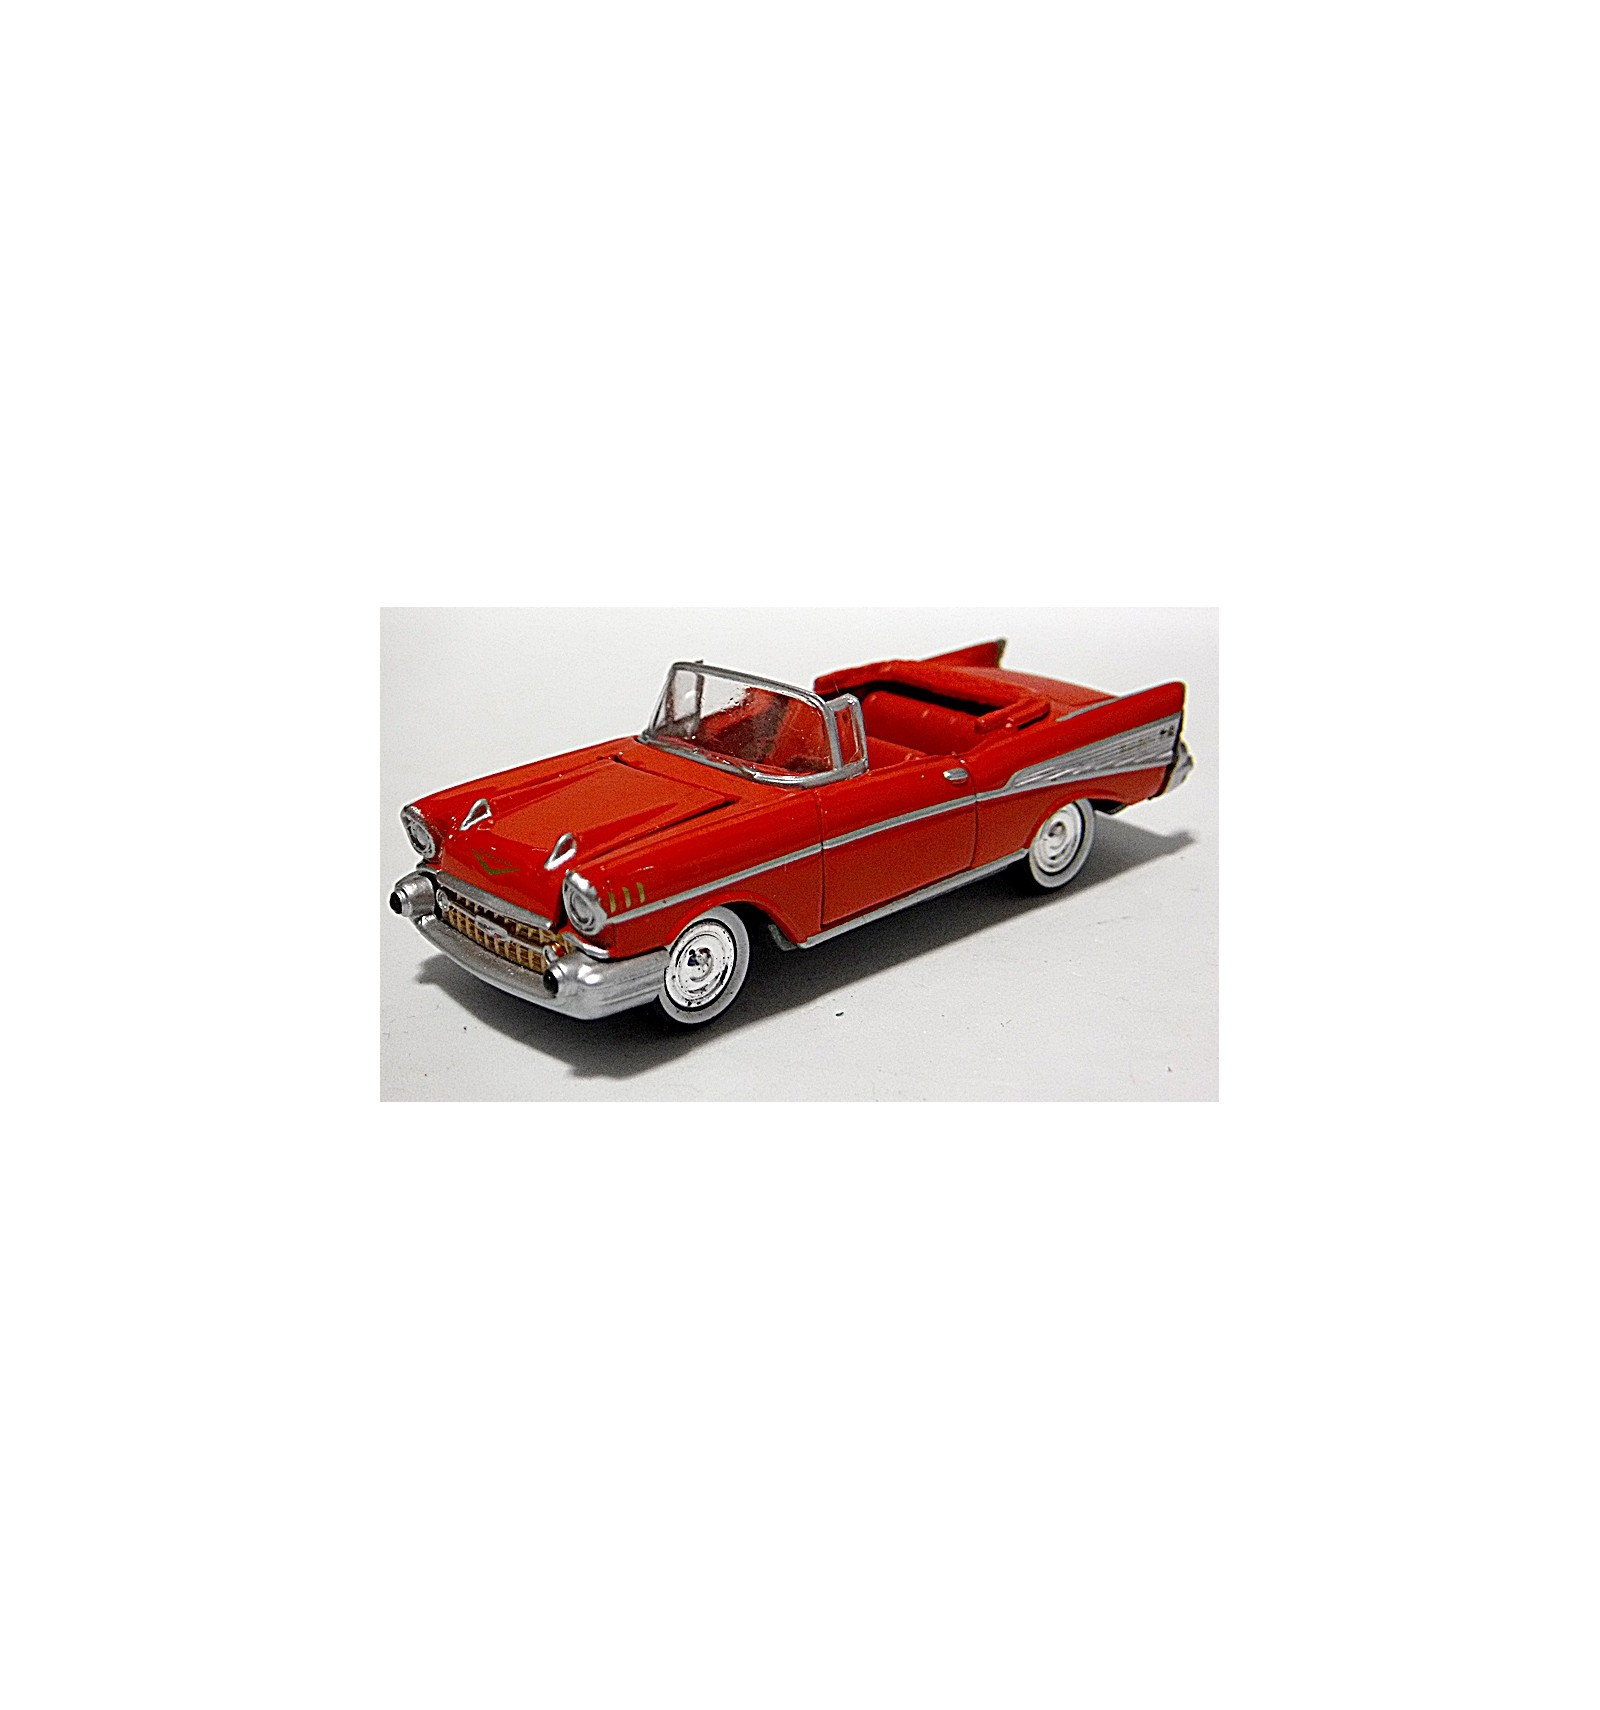 Johnny Lightning 1957 Chevrolet Bel Air Convertible Global Diecast 1978